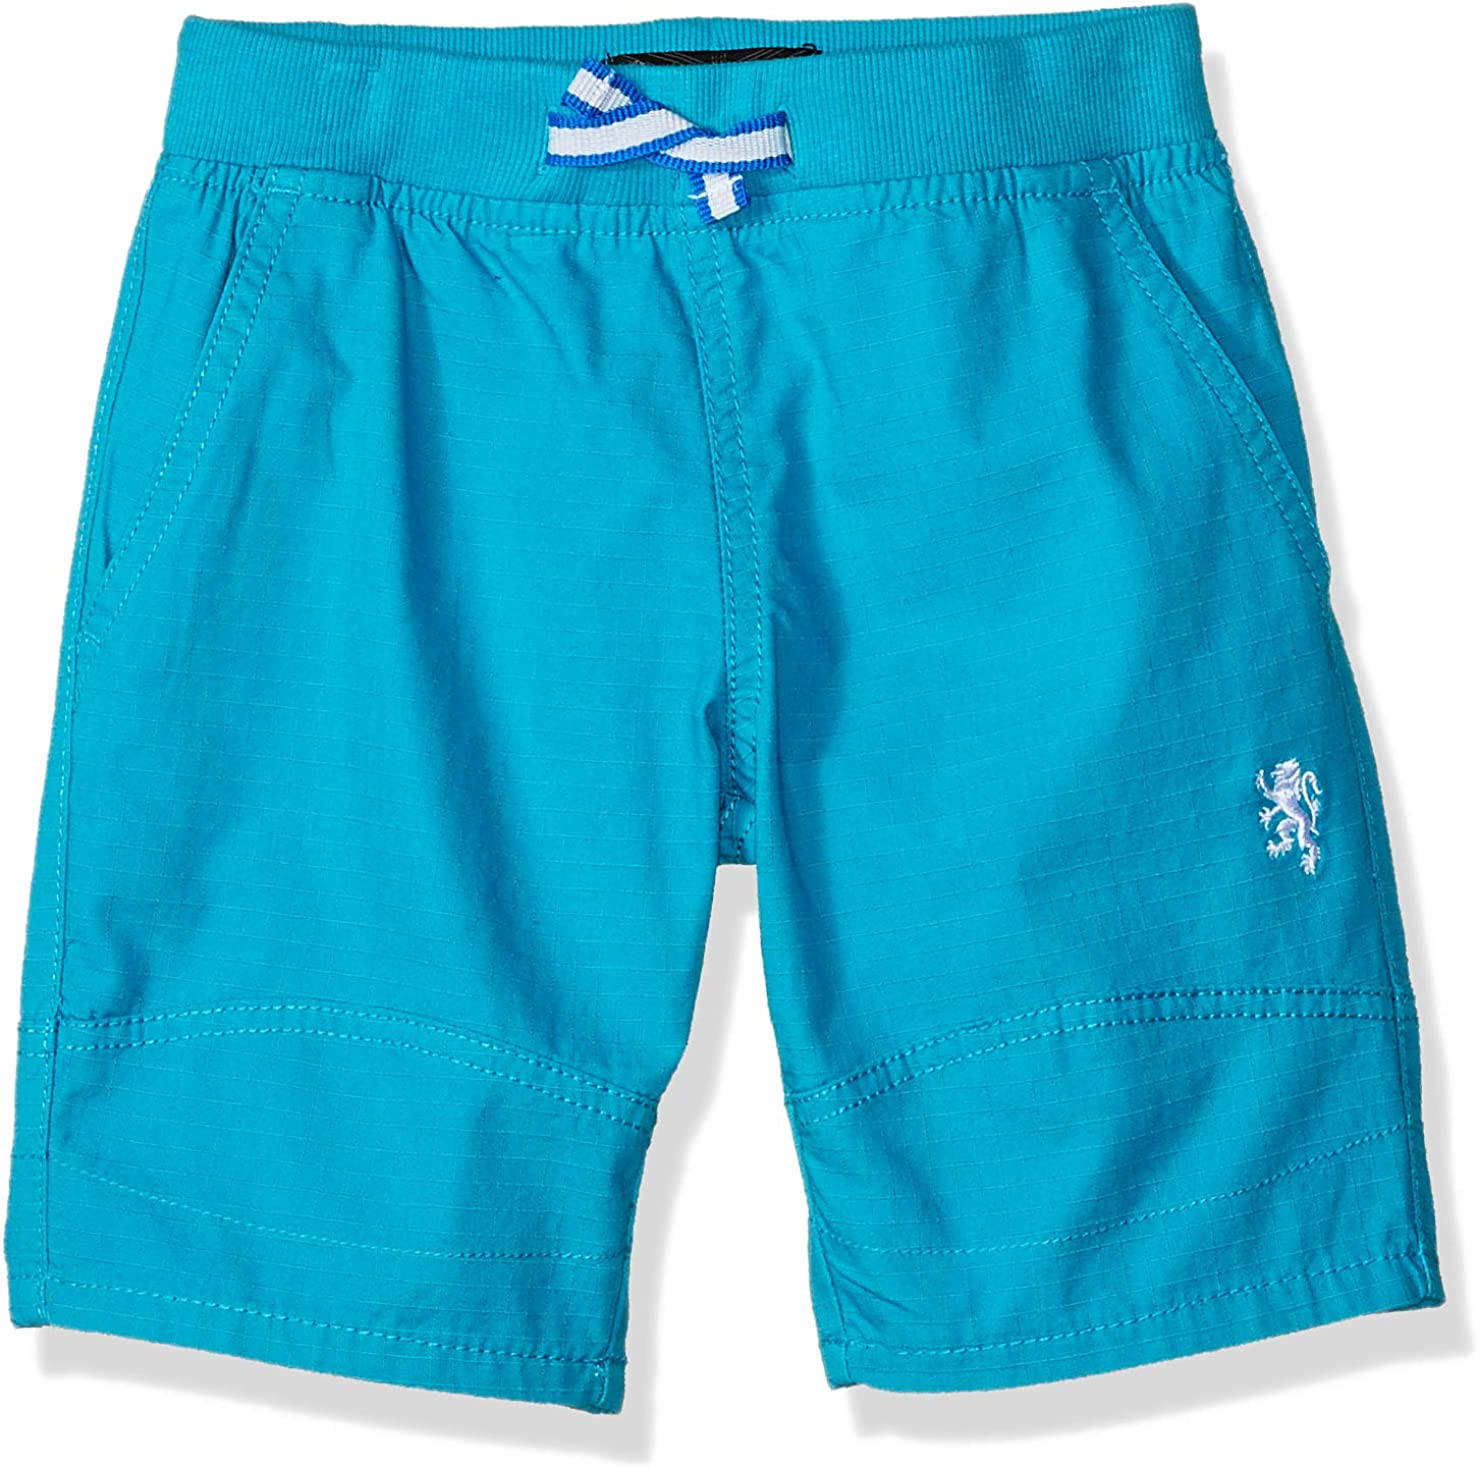 English Laundry Boys' Pull-on Ripstop Short